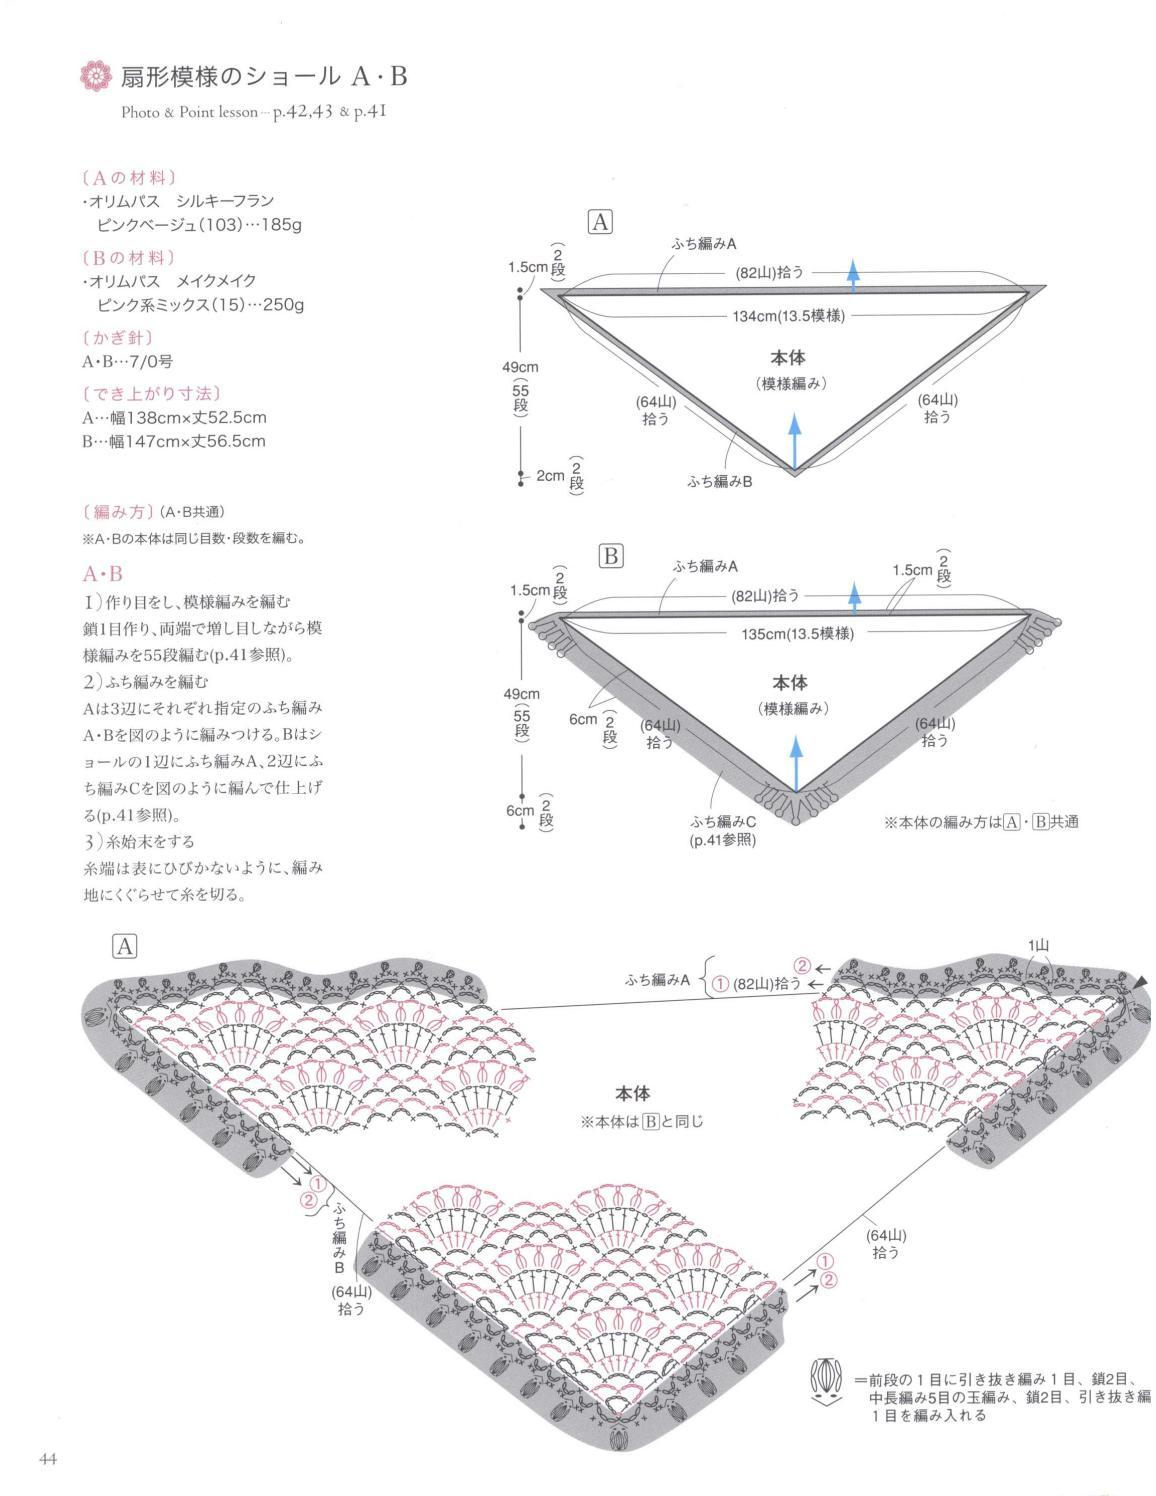 Asahi original crochet best selection 2012 page 44